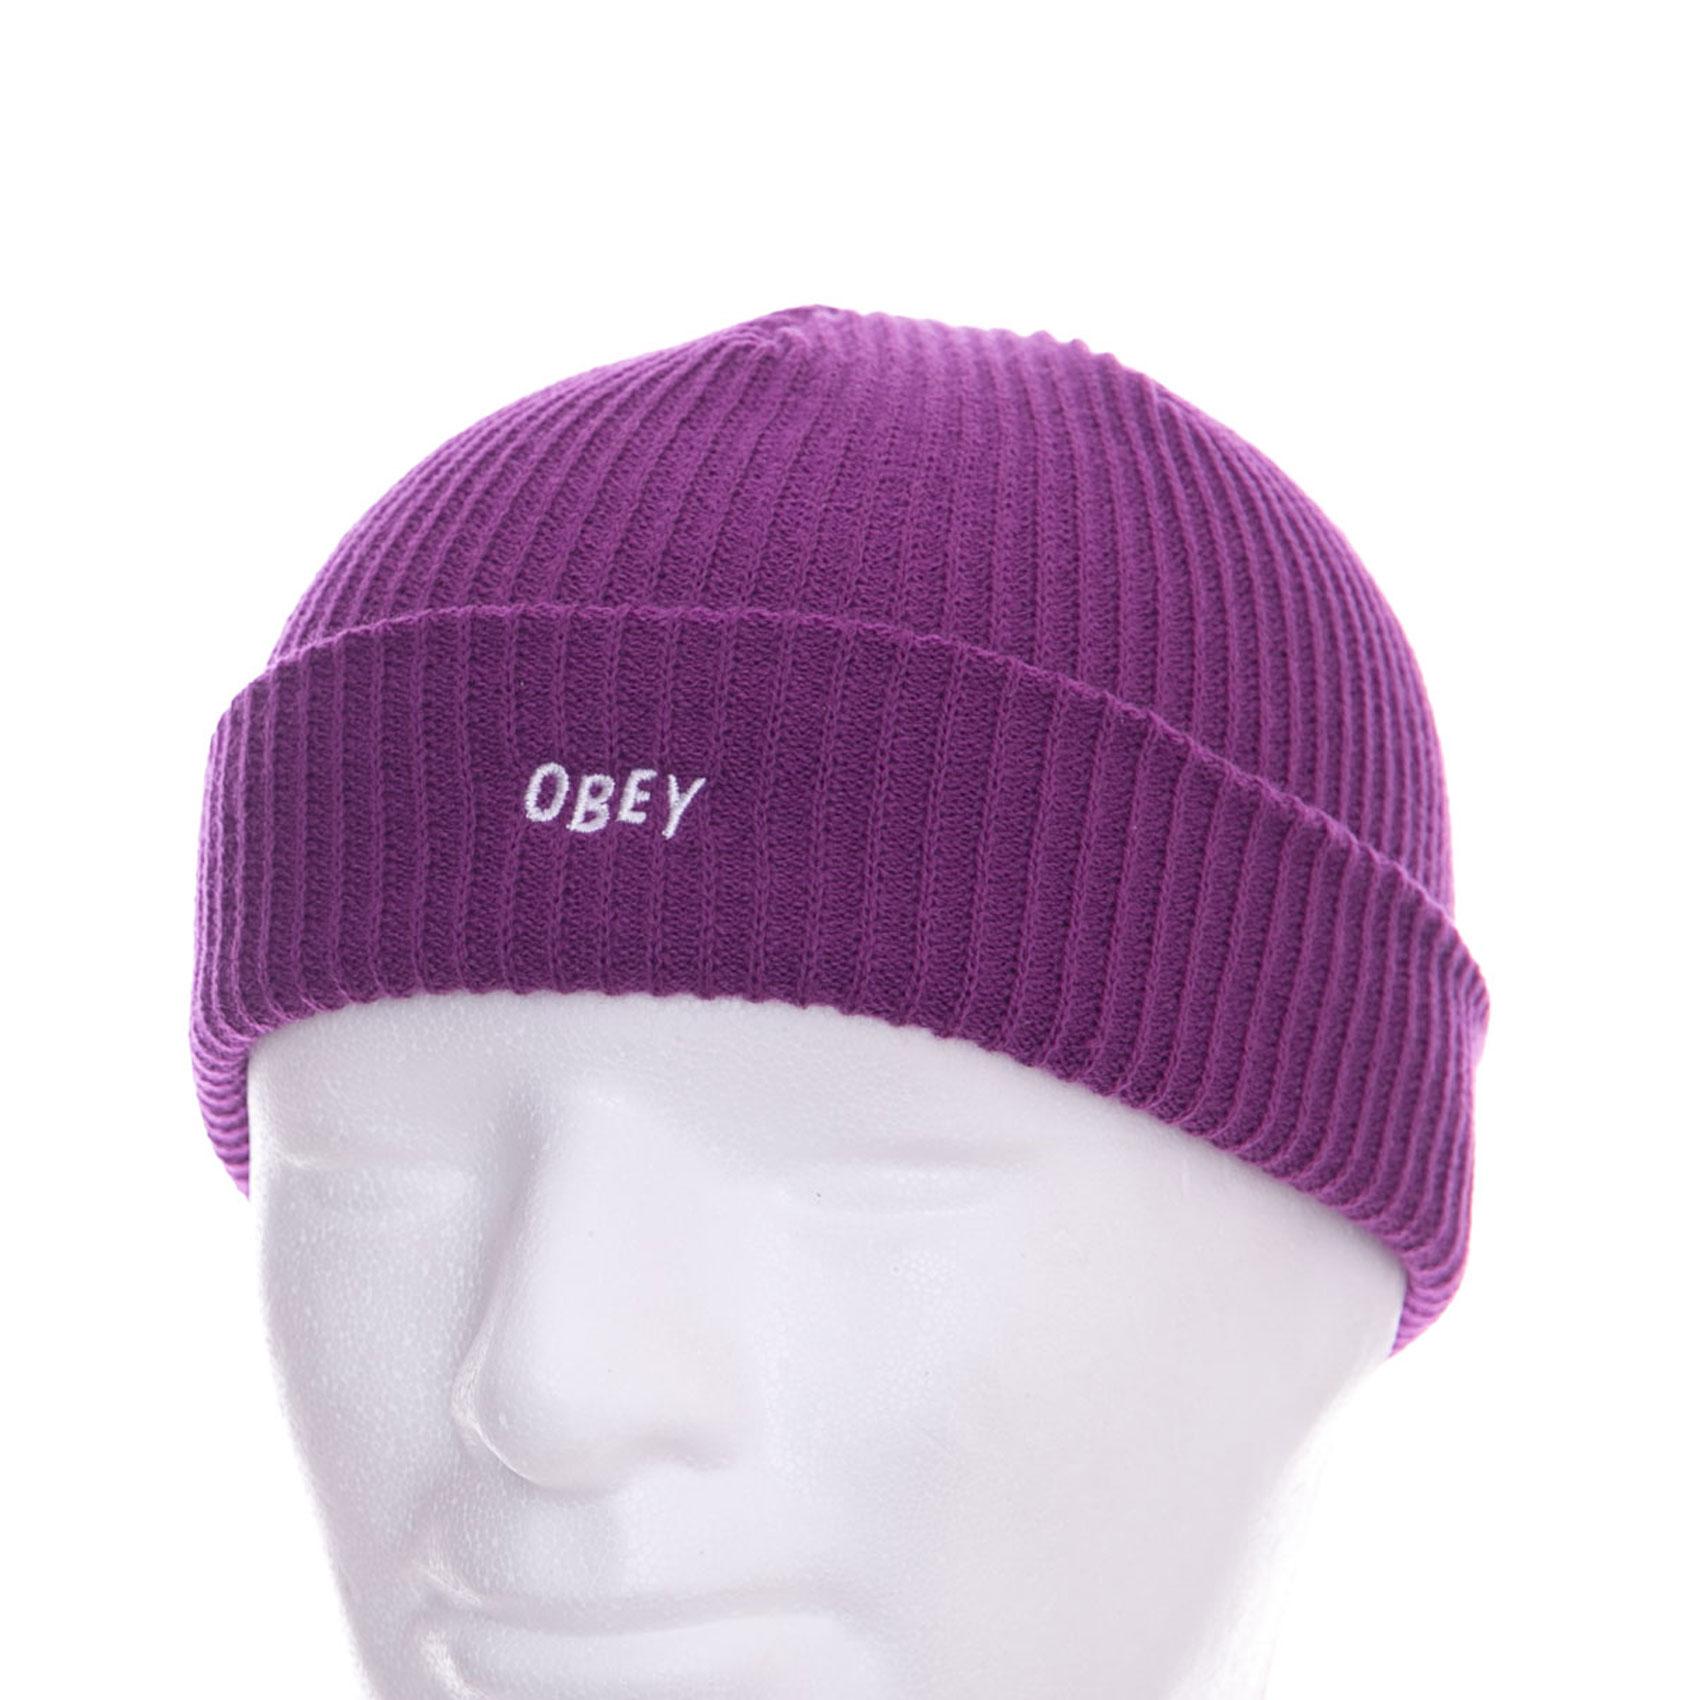 Obey Cappelli Hangman Beanie Plum Purple Viola  4f5e80de2266